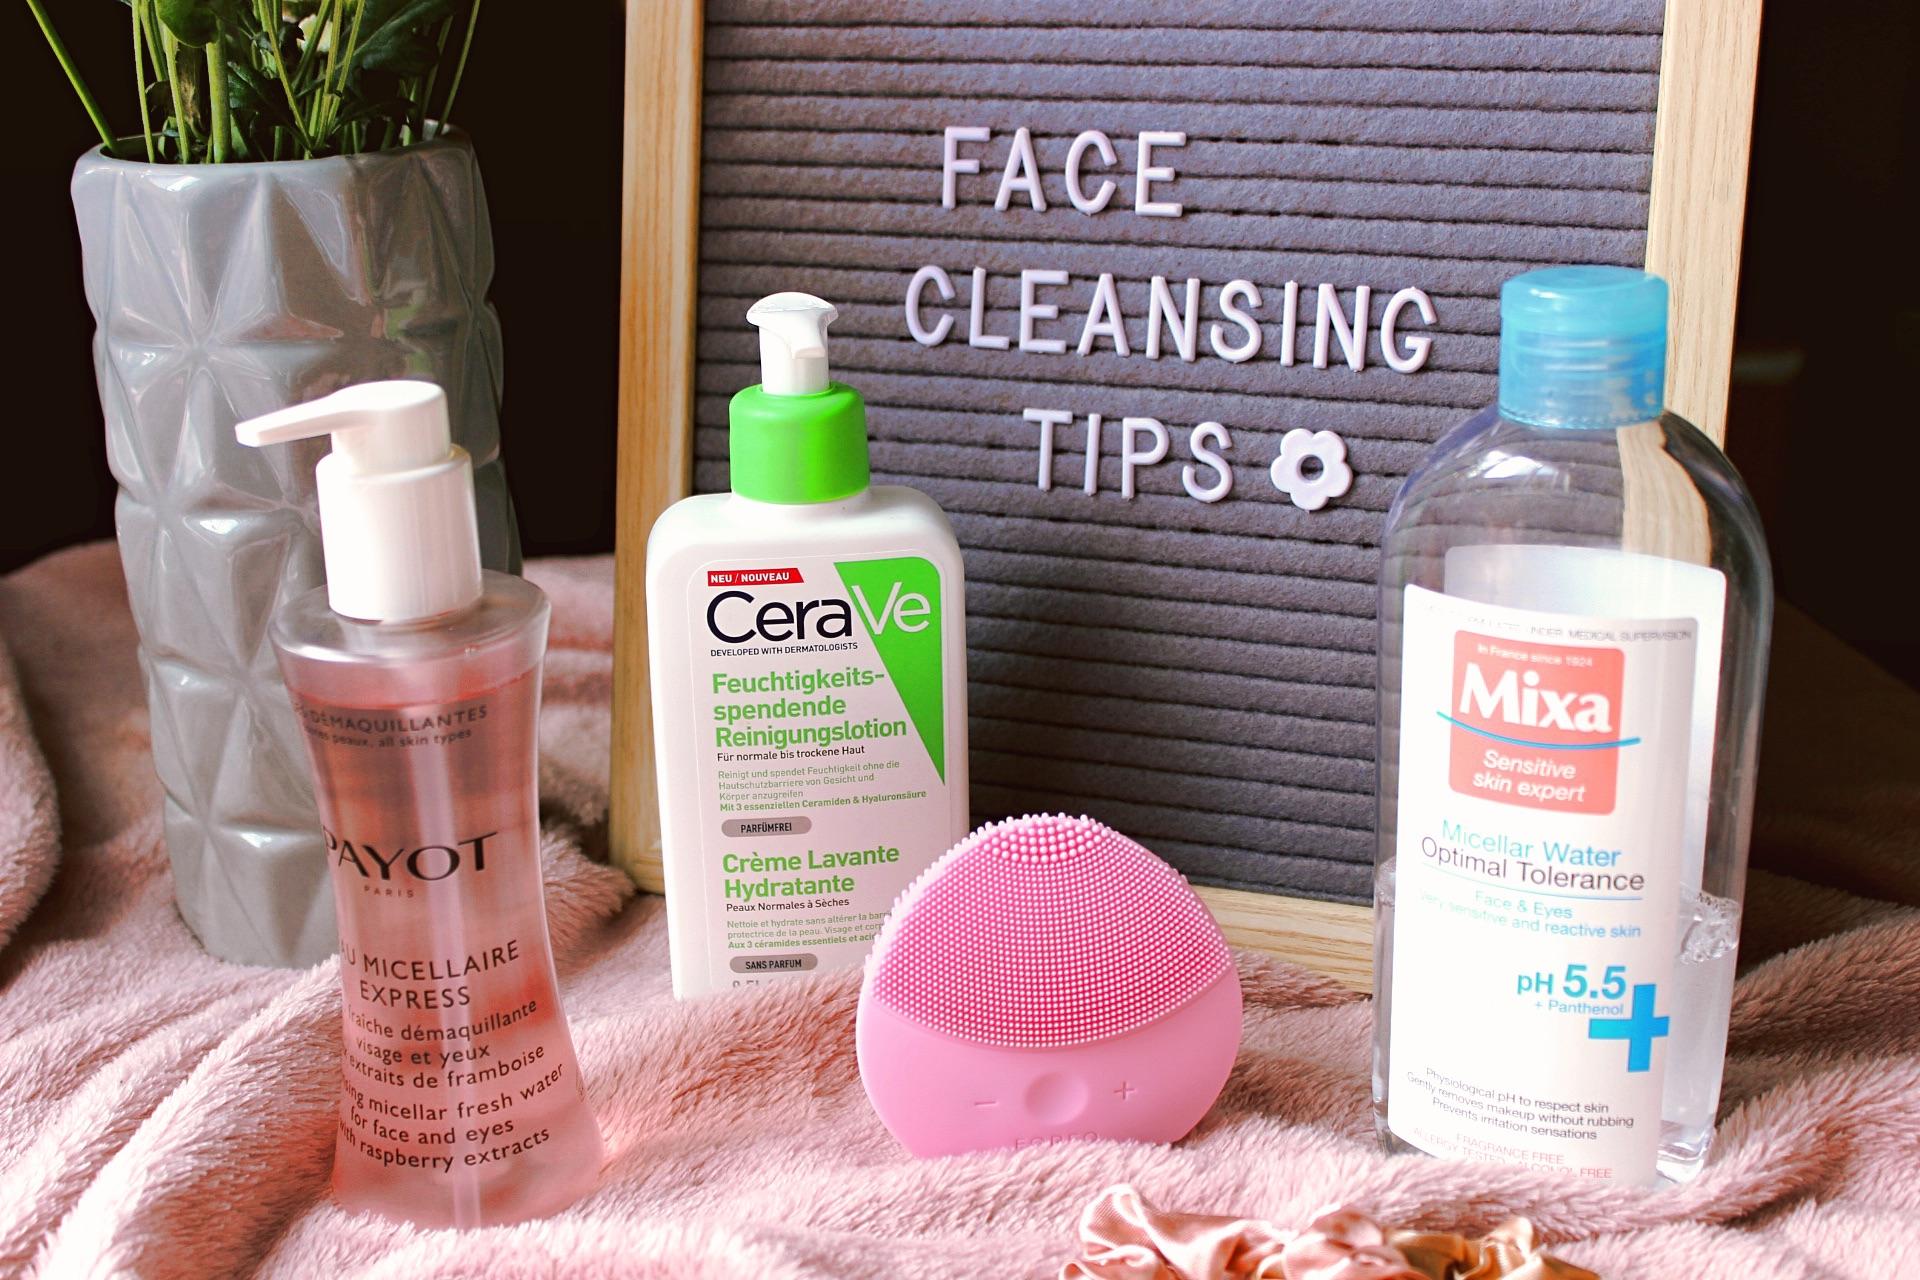 почистване на лицето съвети почистване на грим съвети мицеларна вода четка за лице